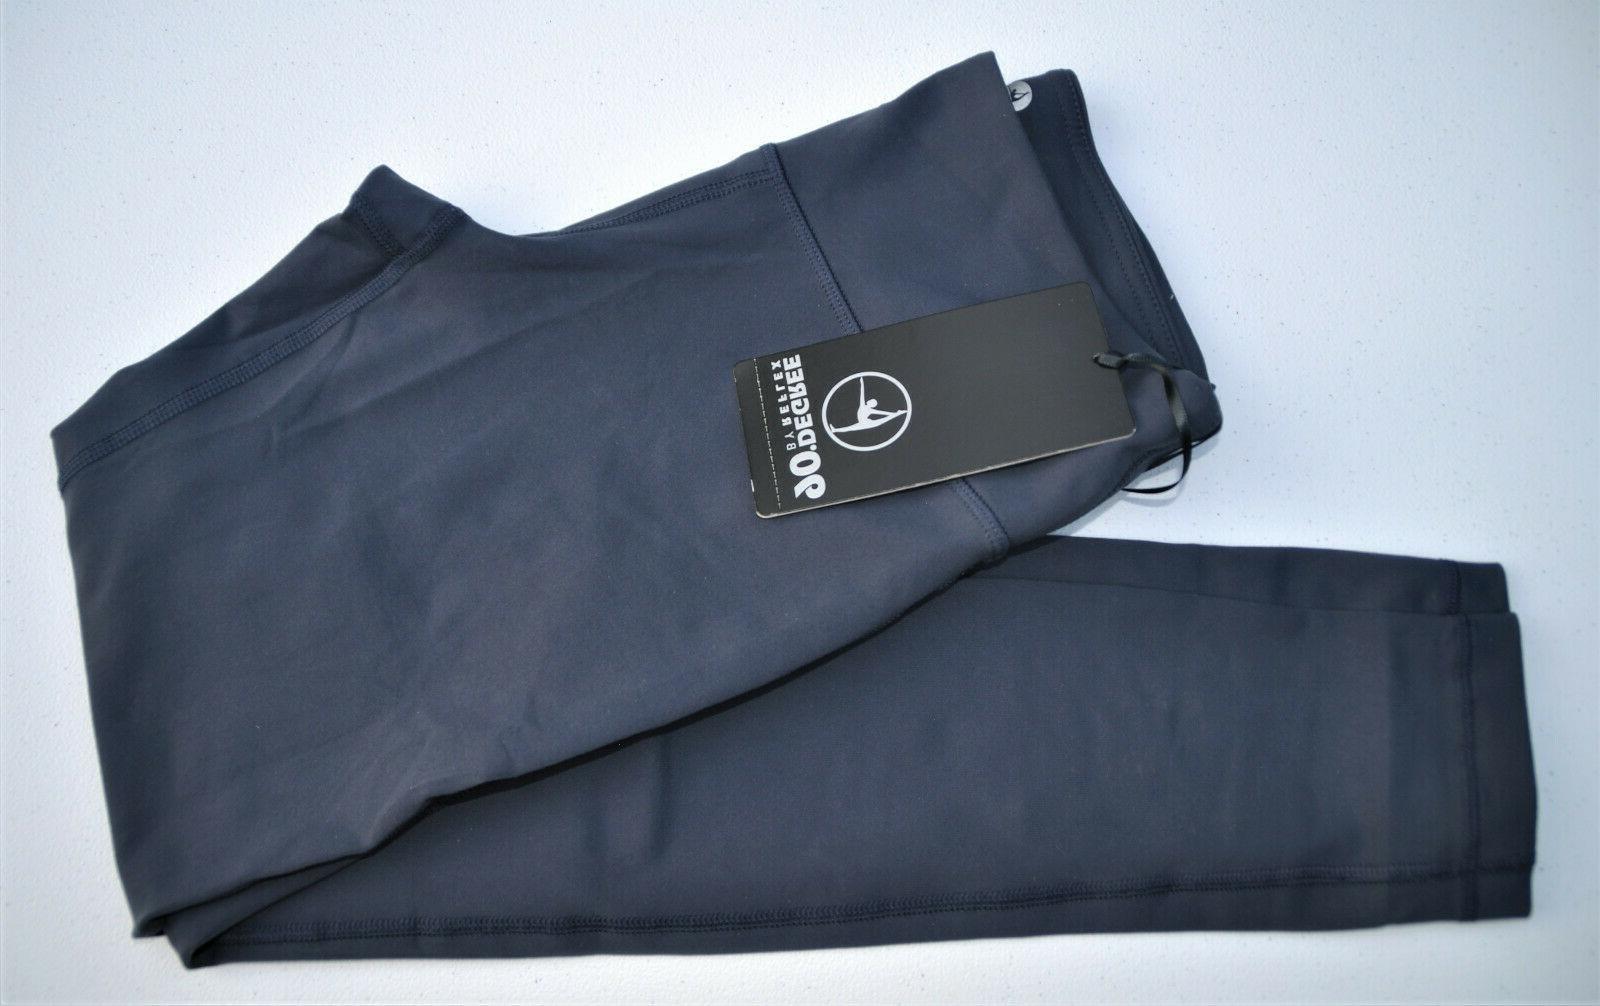 BNWT by Reflex Power Yoga Legging Pants